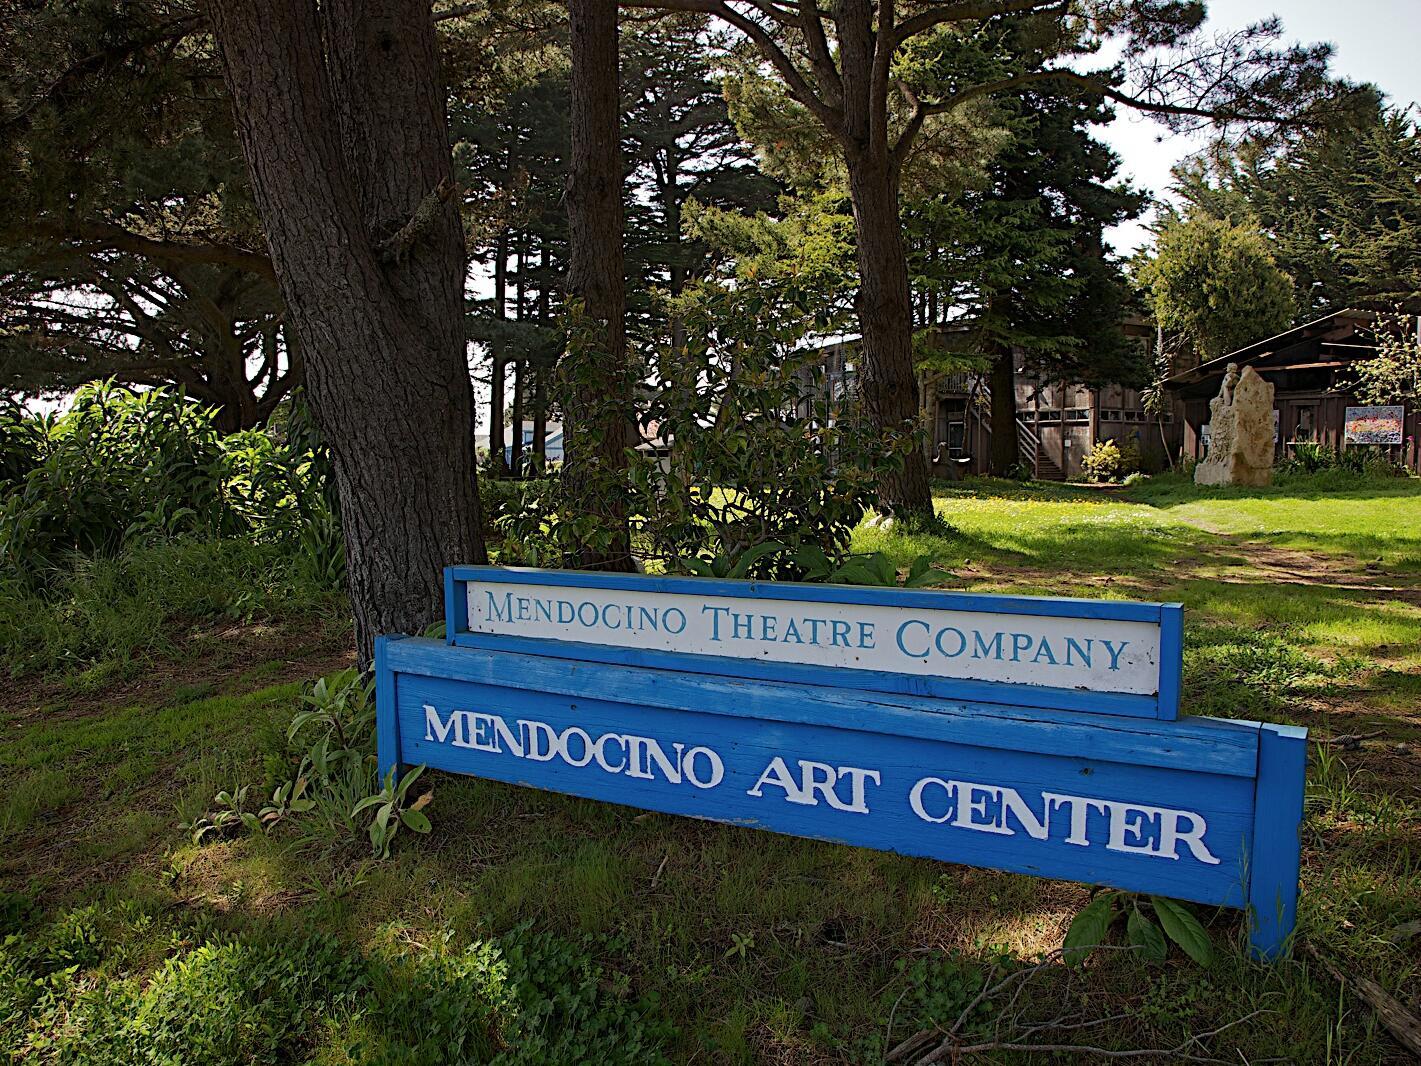 Mendocino Art Center name board near The Heritage House Resort